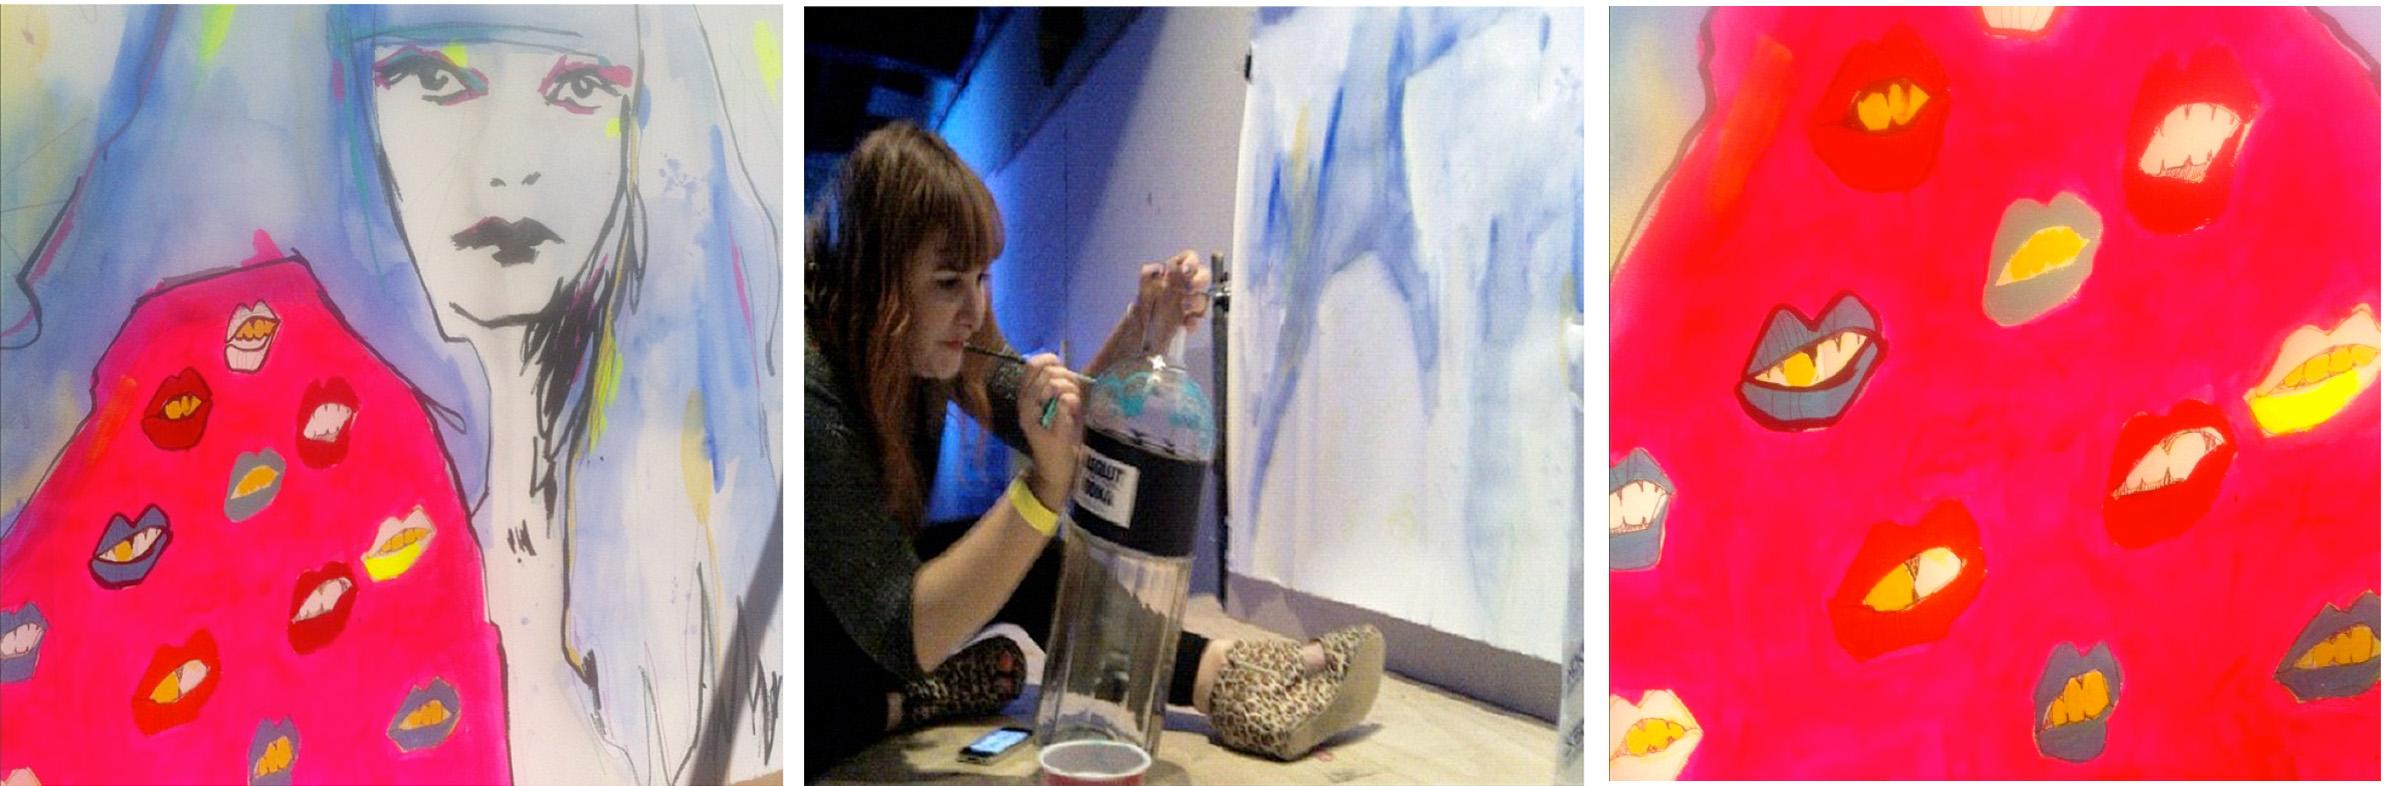 Absolut Vodka x Headstudio Party Mural Rebecca Wetzler